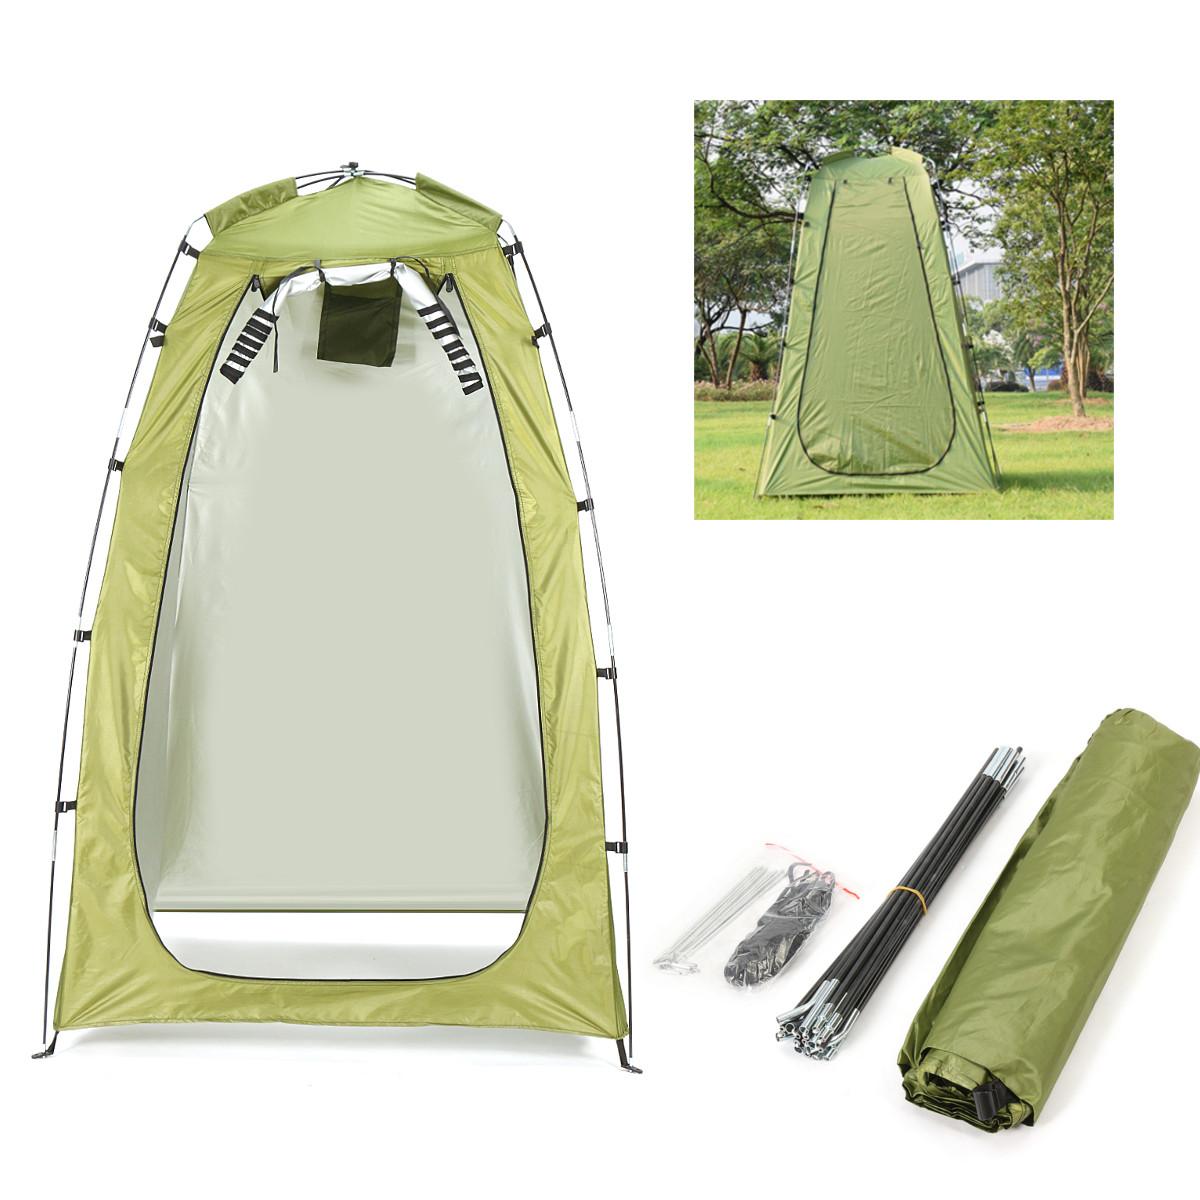 Outdoor Portable Pop-up Tent Camping Shower Bathroom Pr